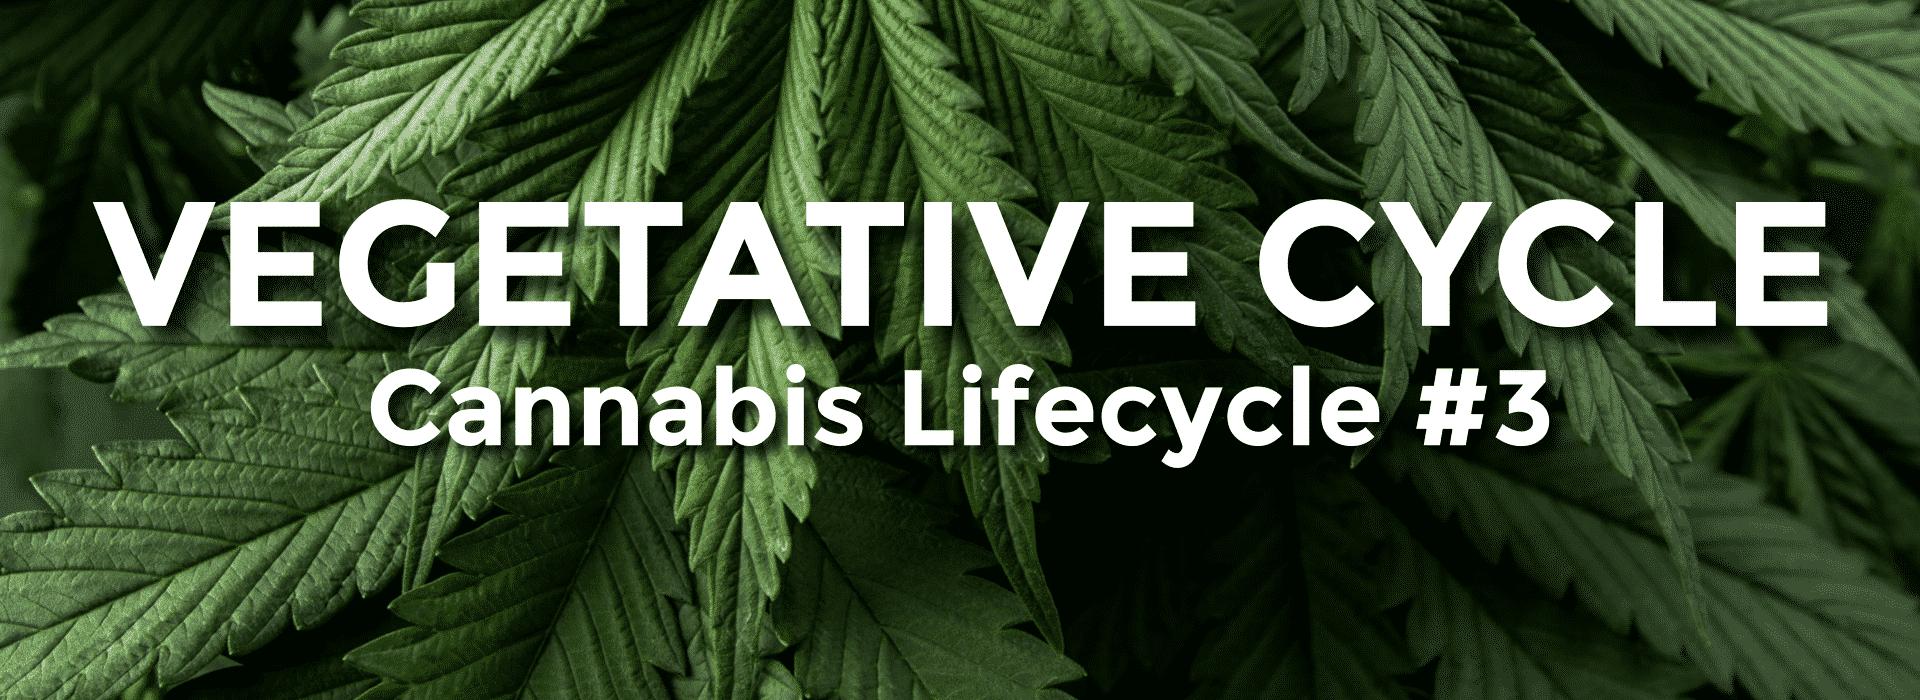 Cannabis Vegetative Cycle - Growing Marijuana